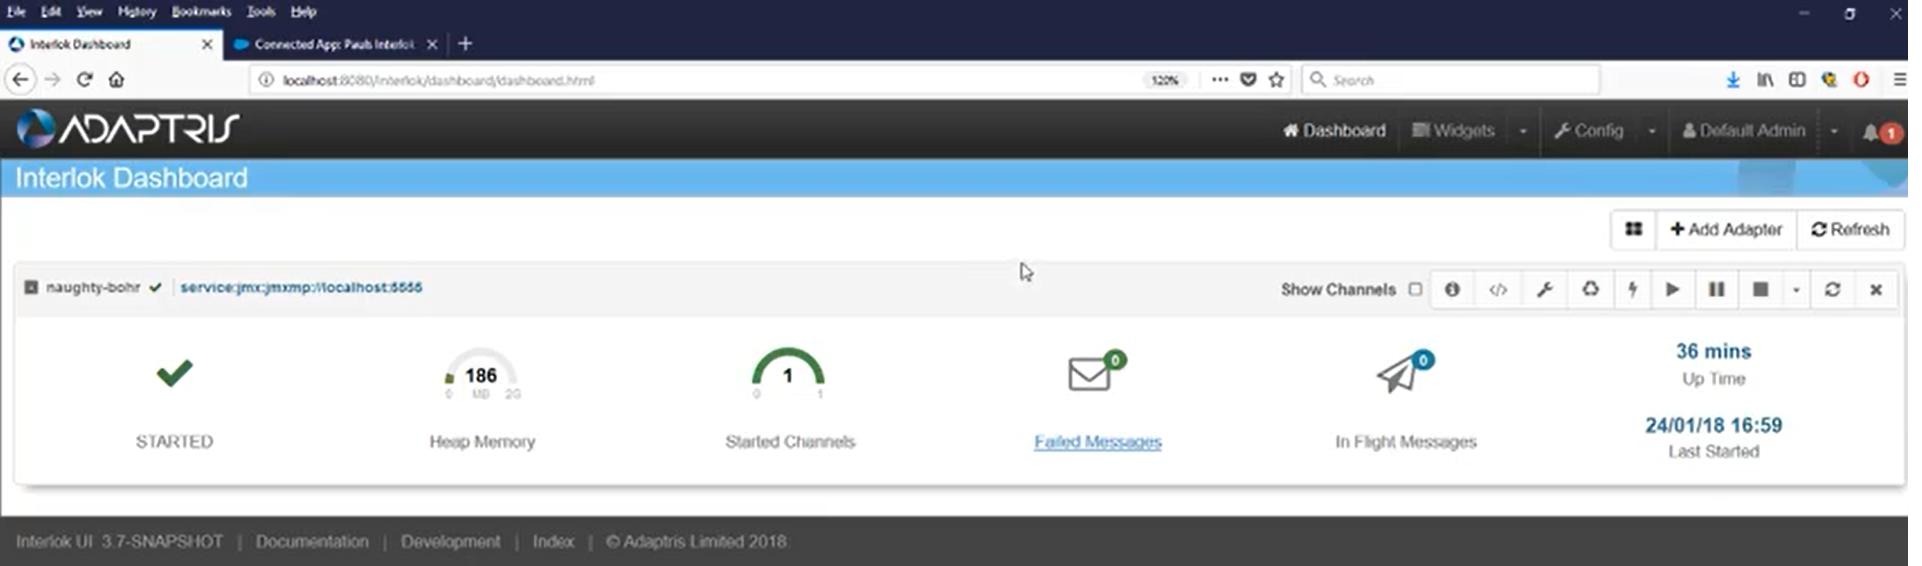 Adaptris Interlok screenshot: Interlok dashboard